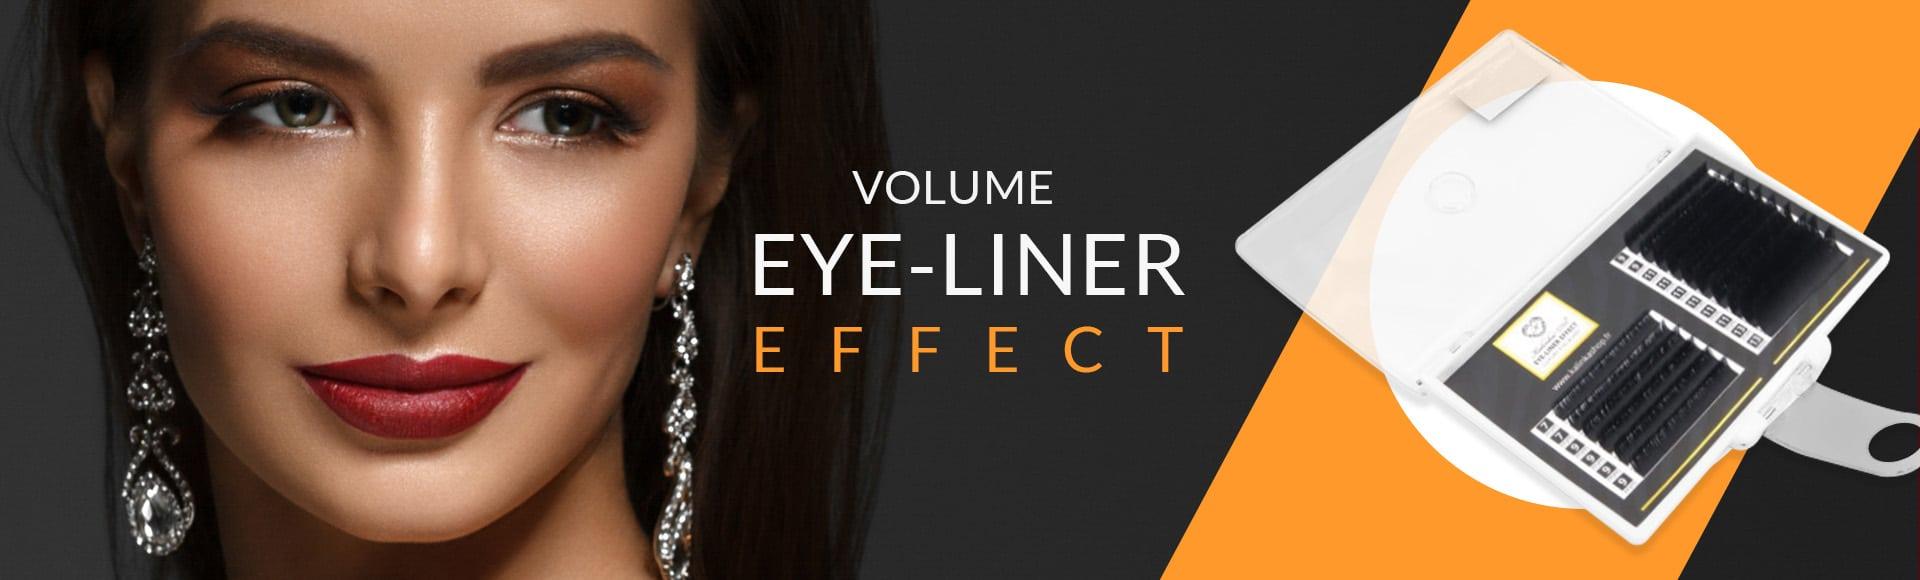 Eye liner effect